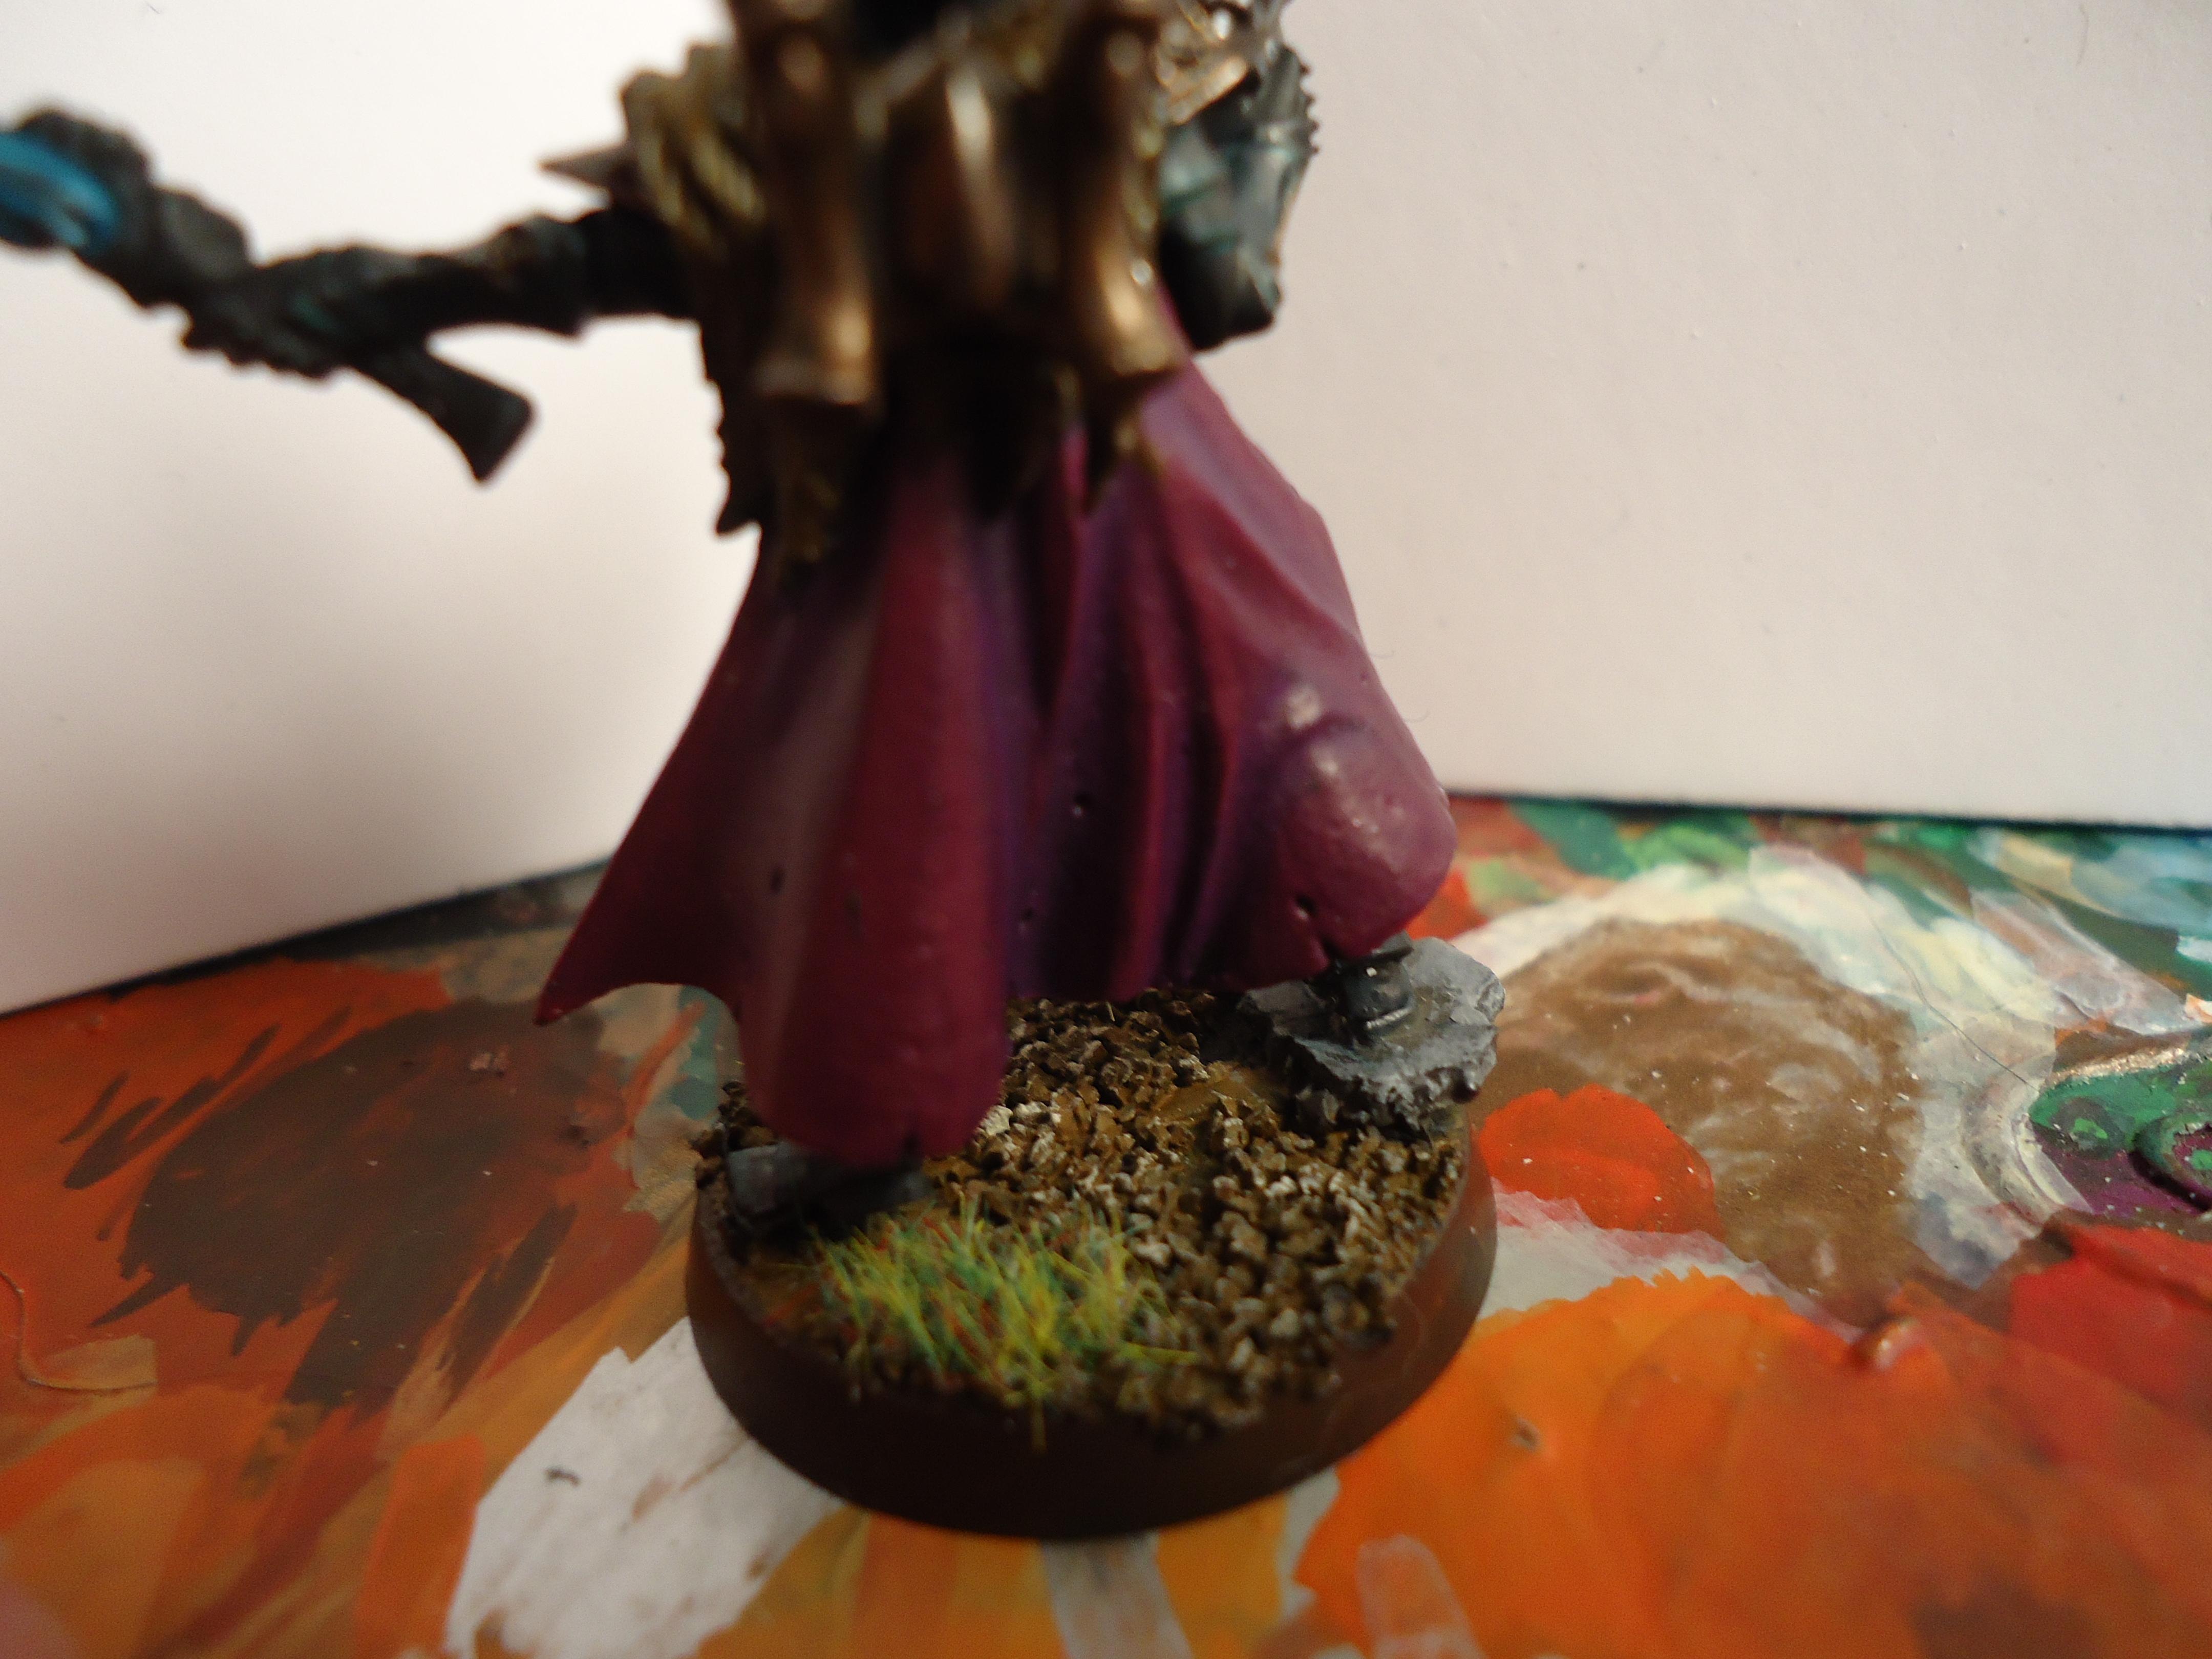 Dark Eldar, dark eldar archon cape close up